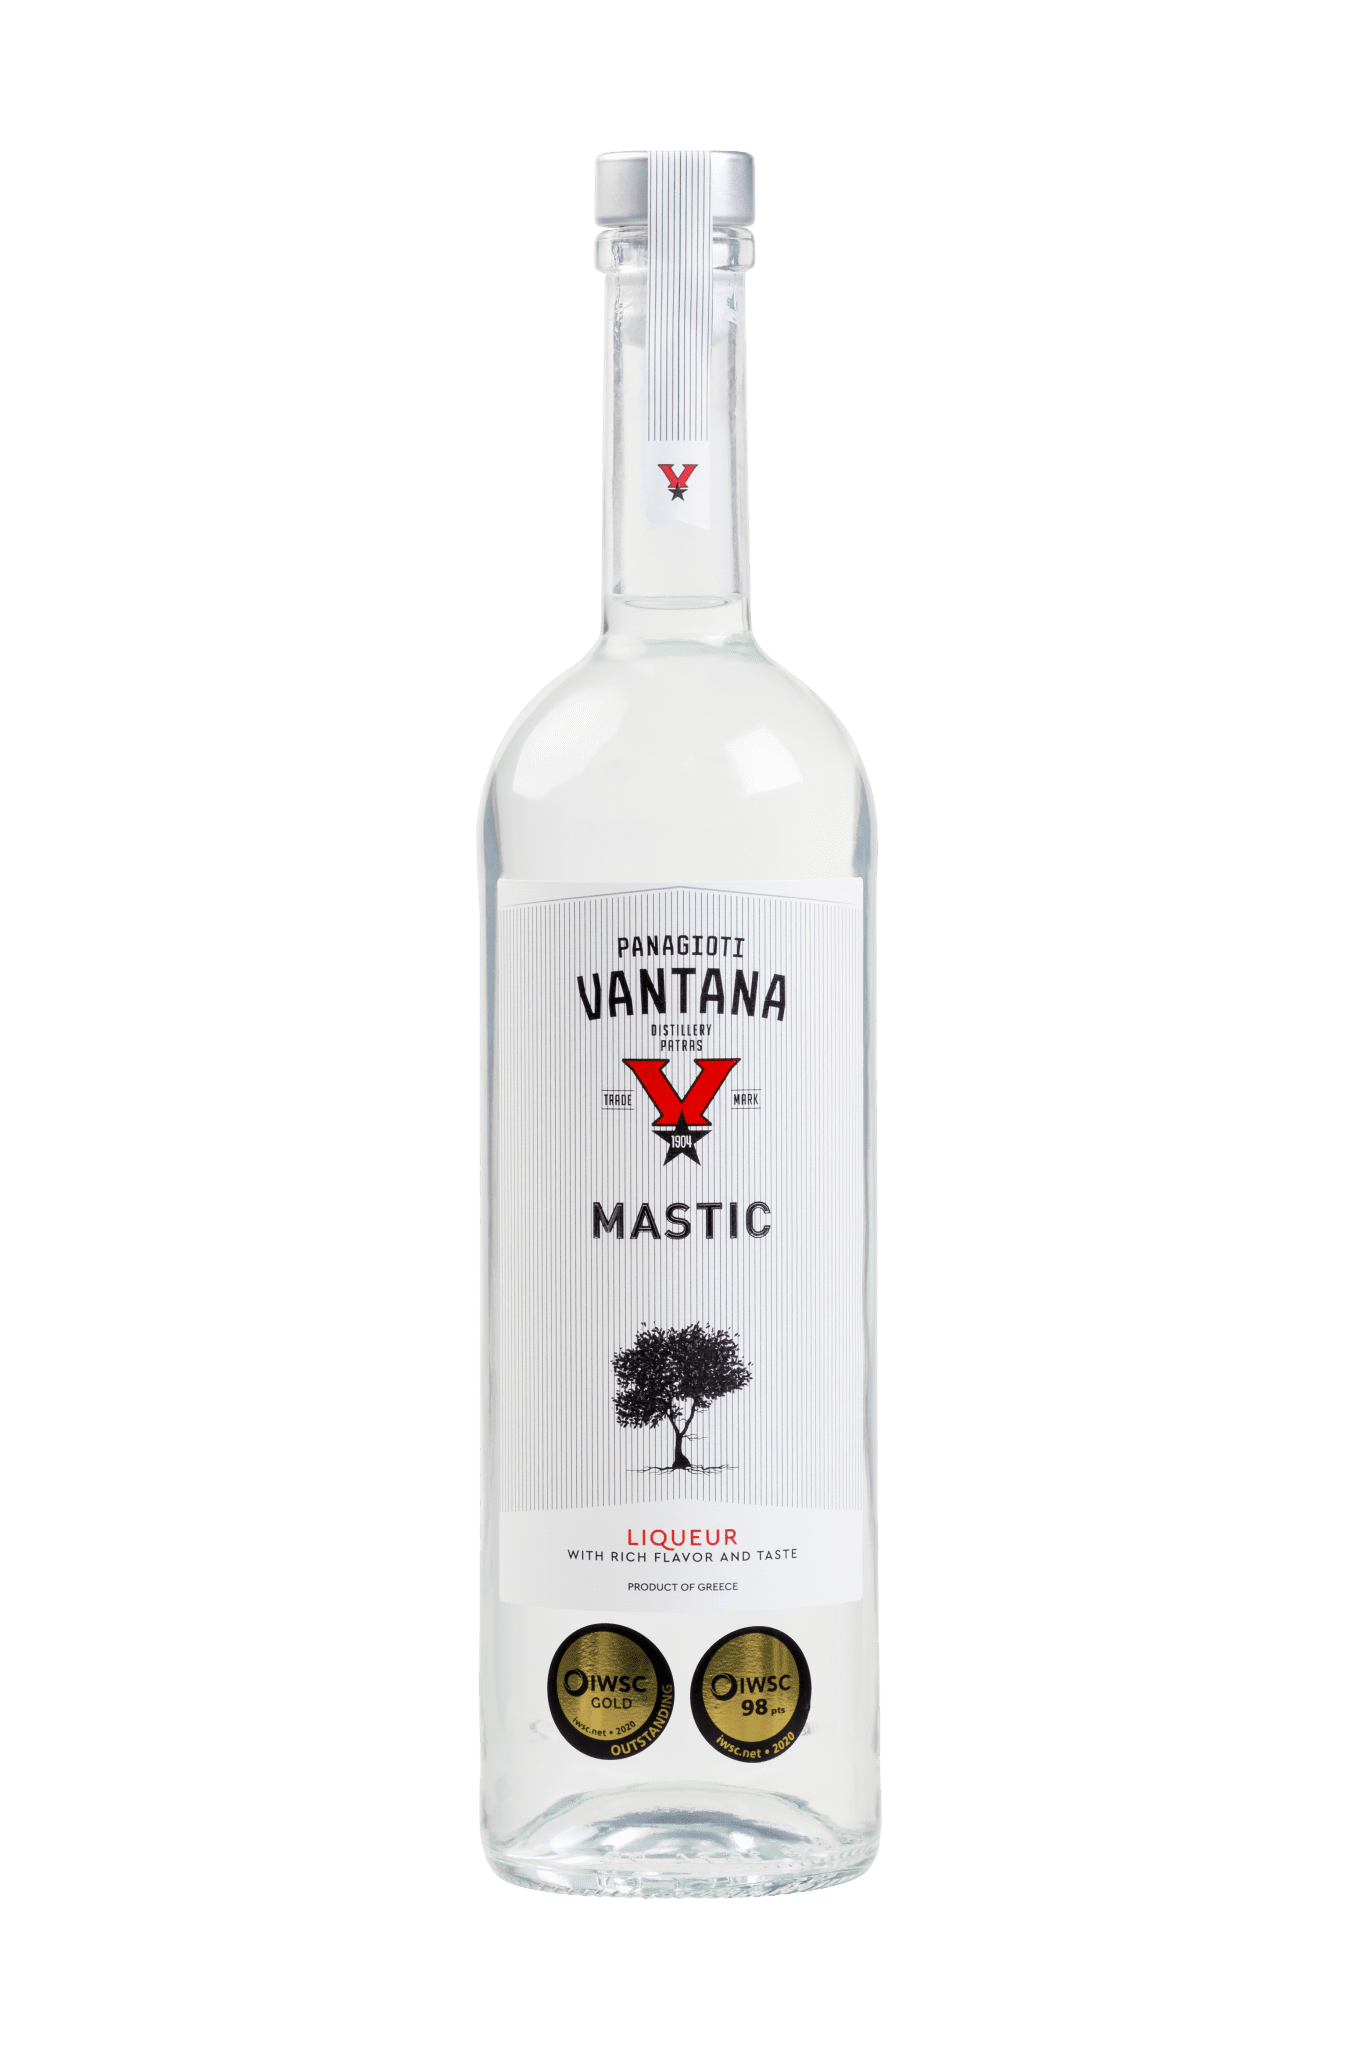 MASTIC VANTANA 22% 700 mL new cork - gold outstanding 98 iwsc 2020